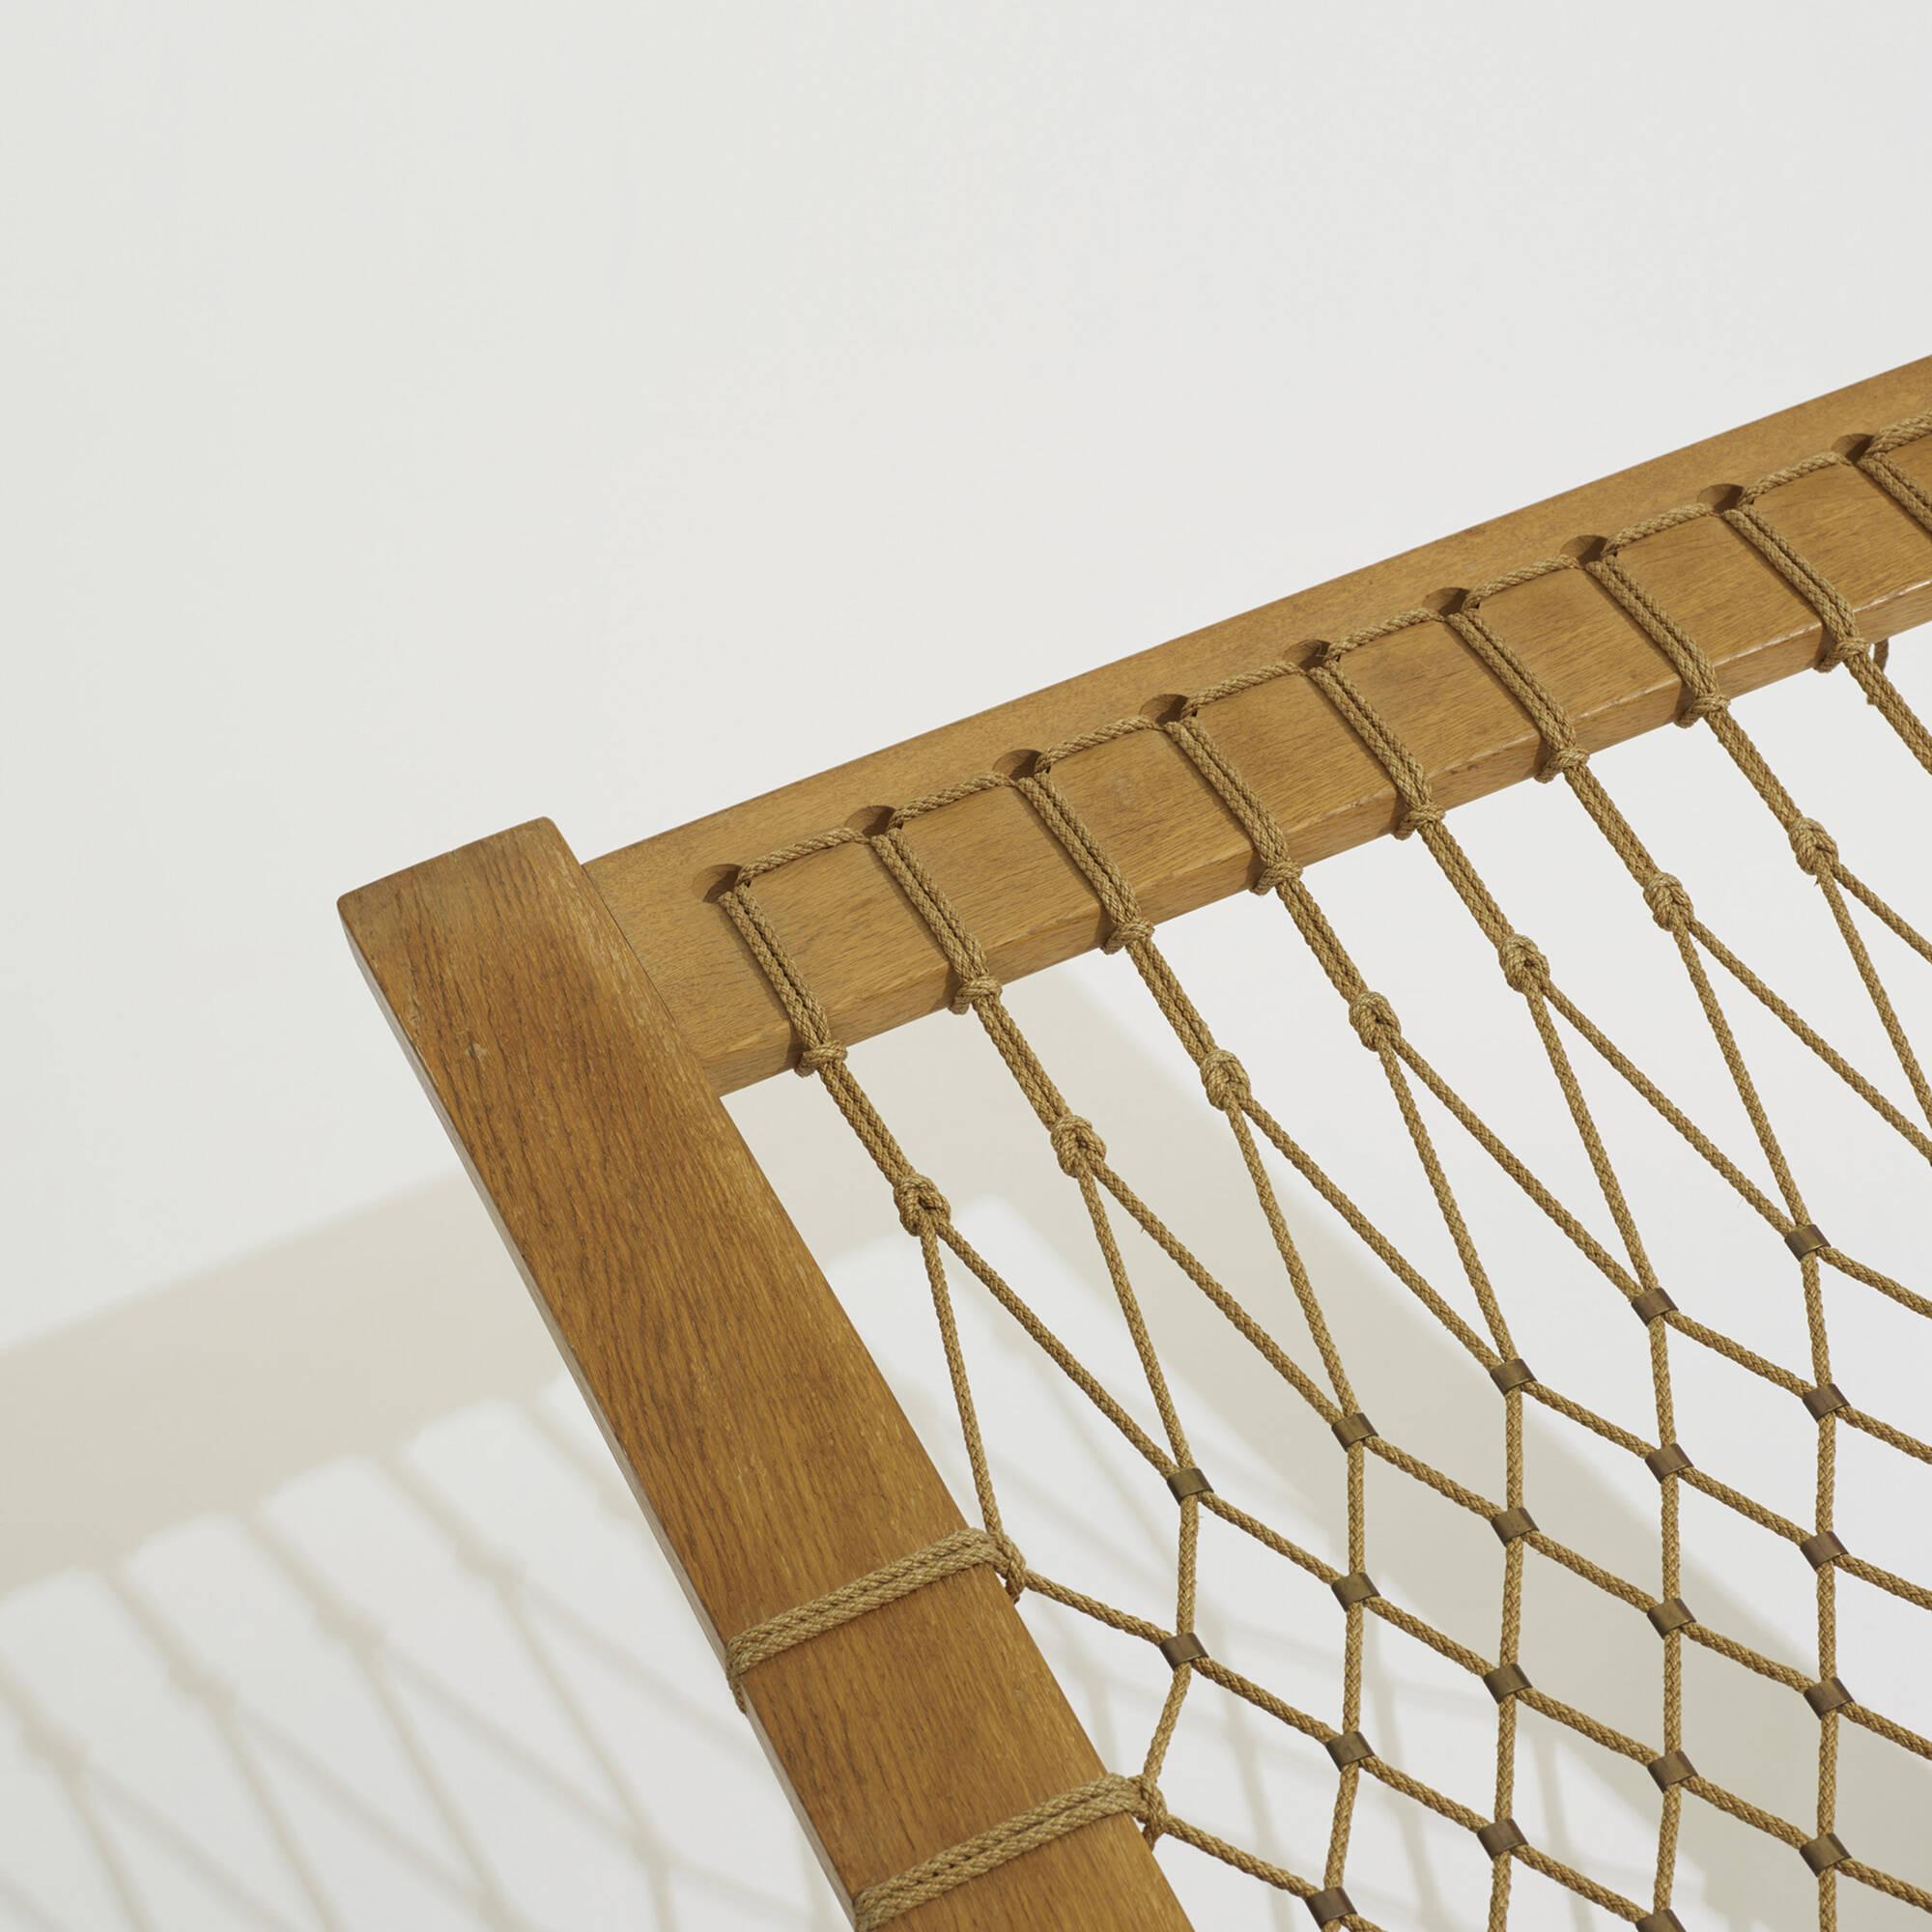 165: Hans J. Wegner / Hammock chaise (5 of 5)